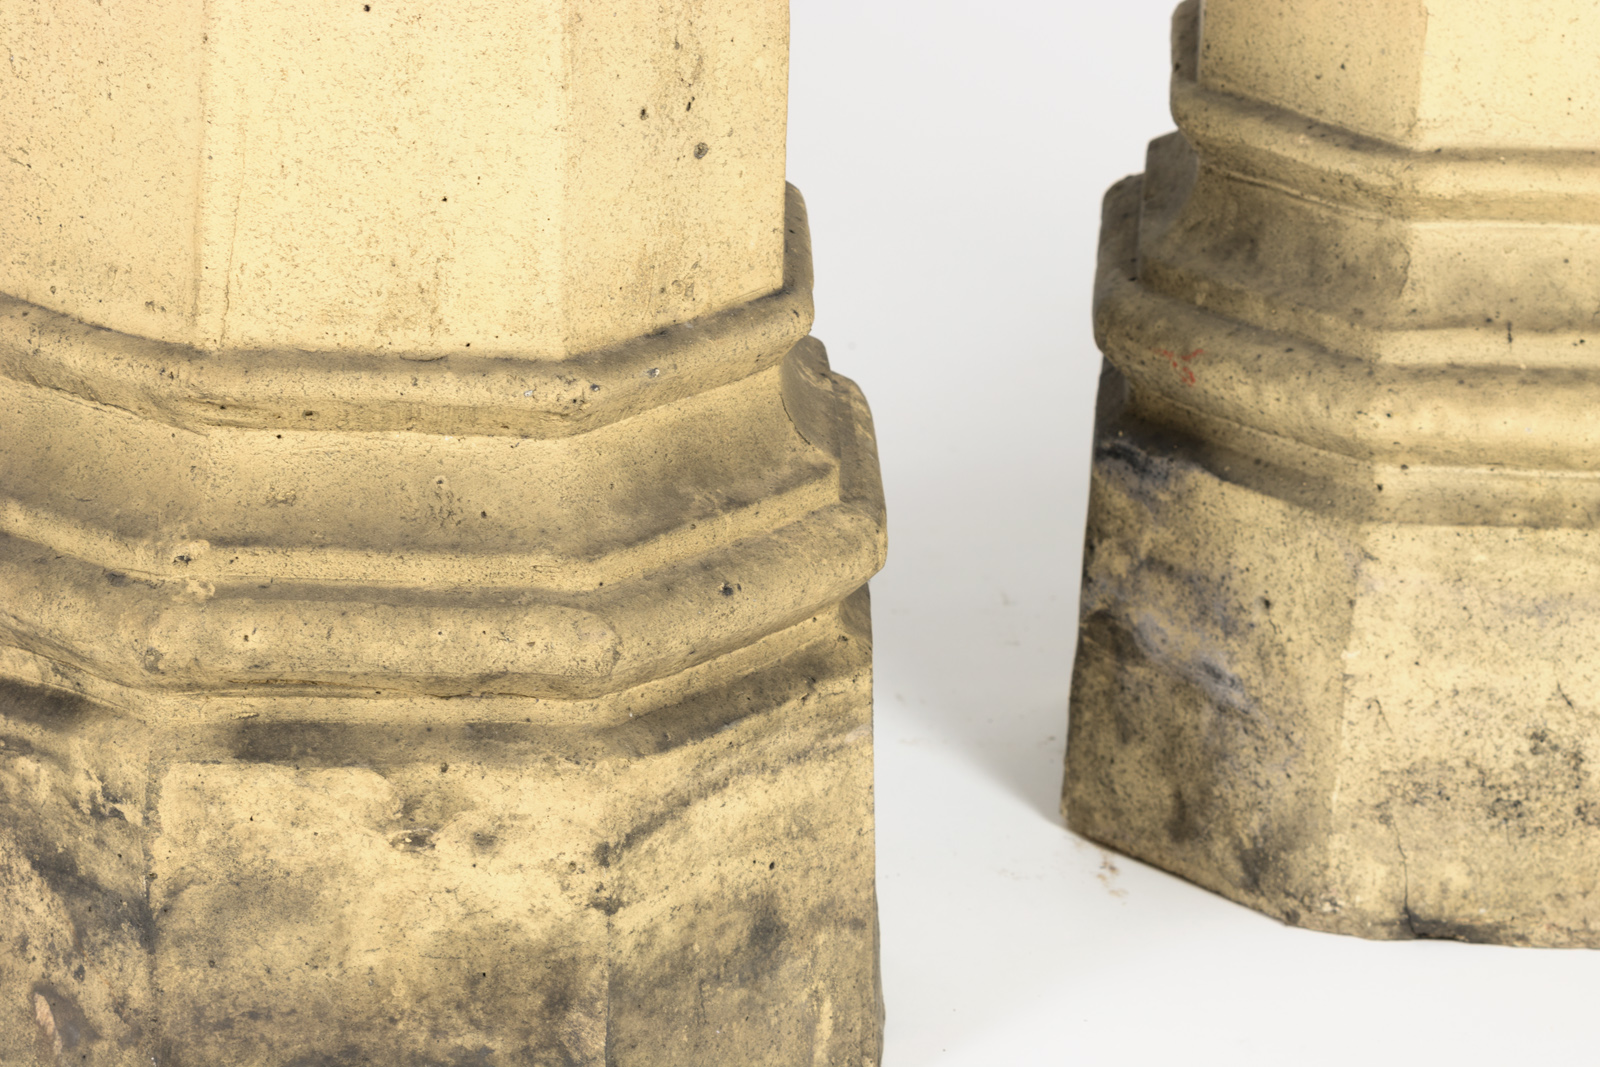 English Vintage Chimney Pots 19th Century 415 355-1690